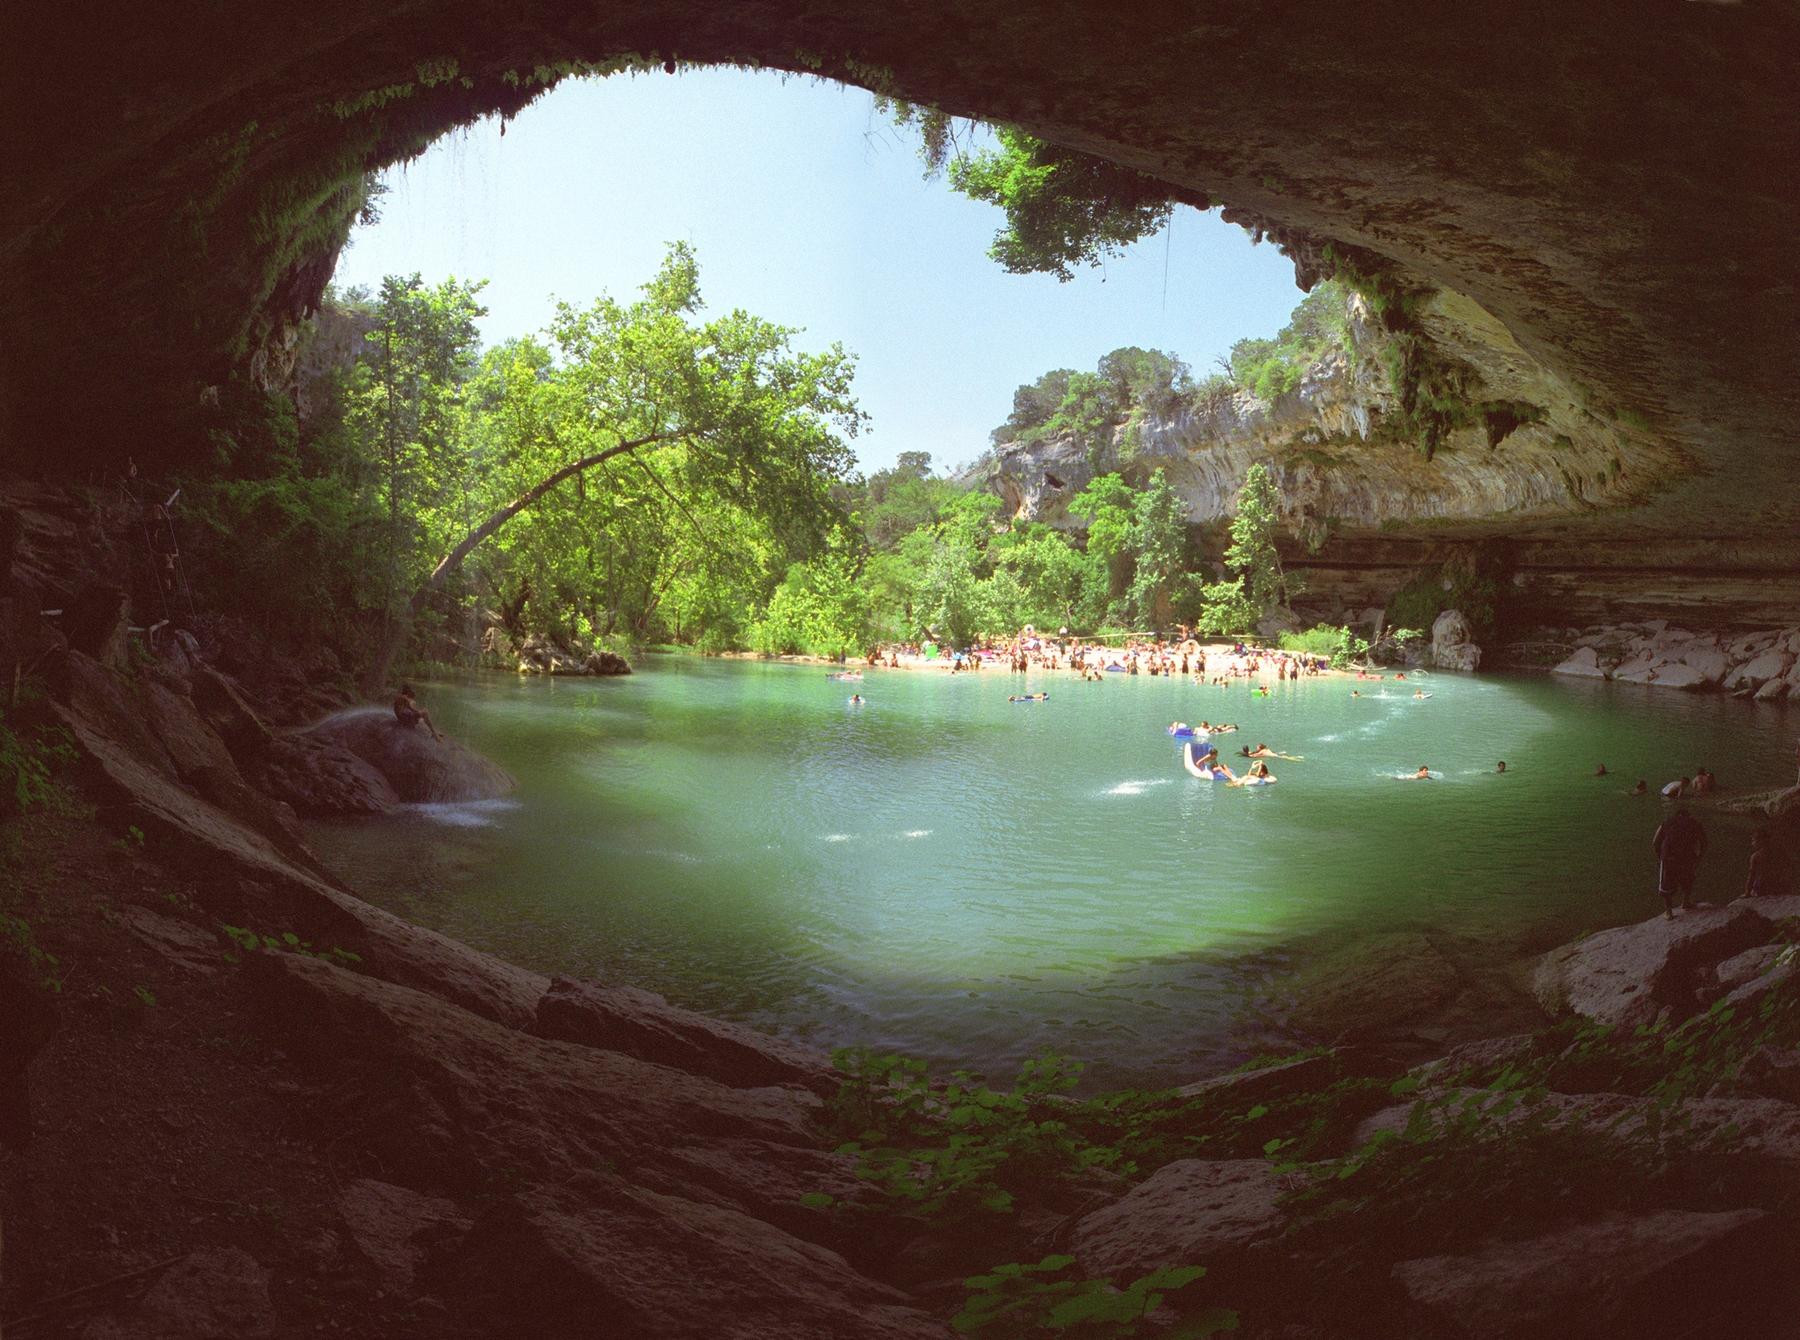 Hamilton pool outside of Austin